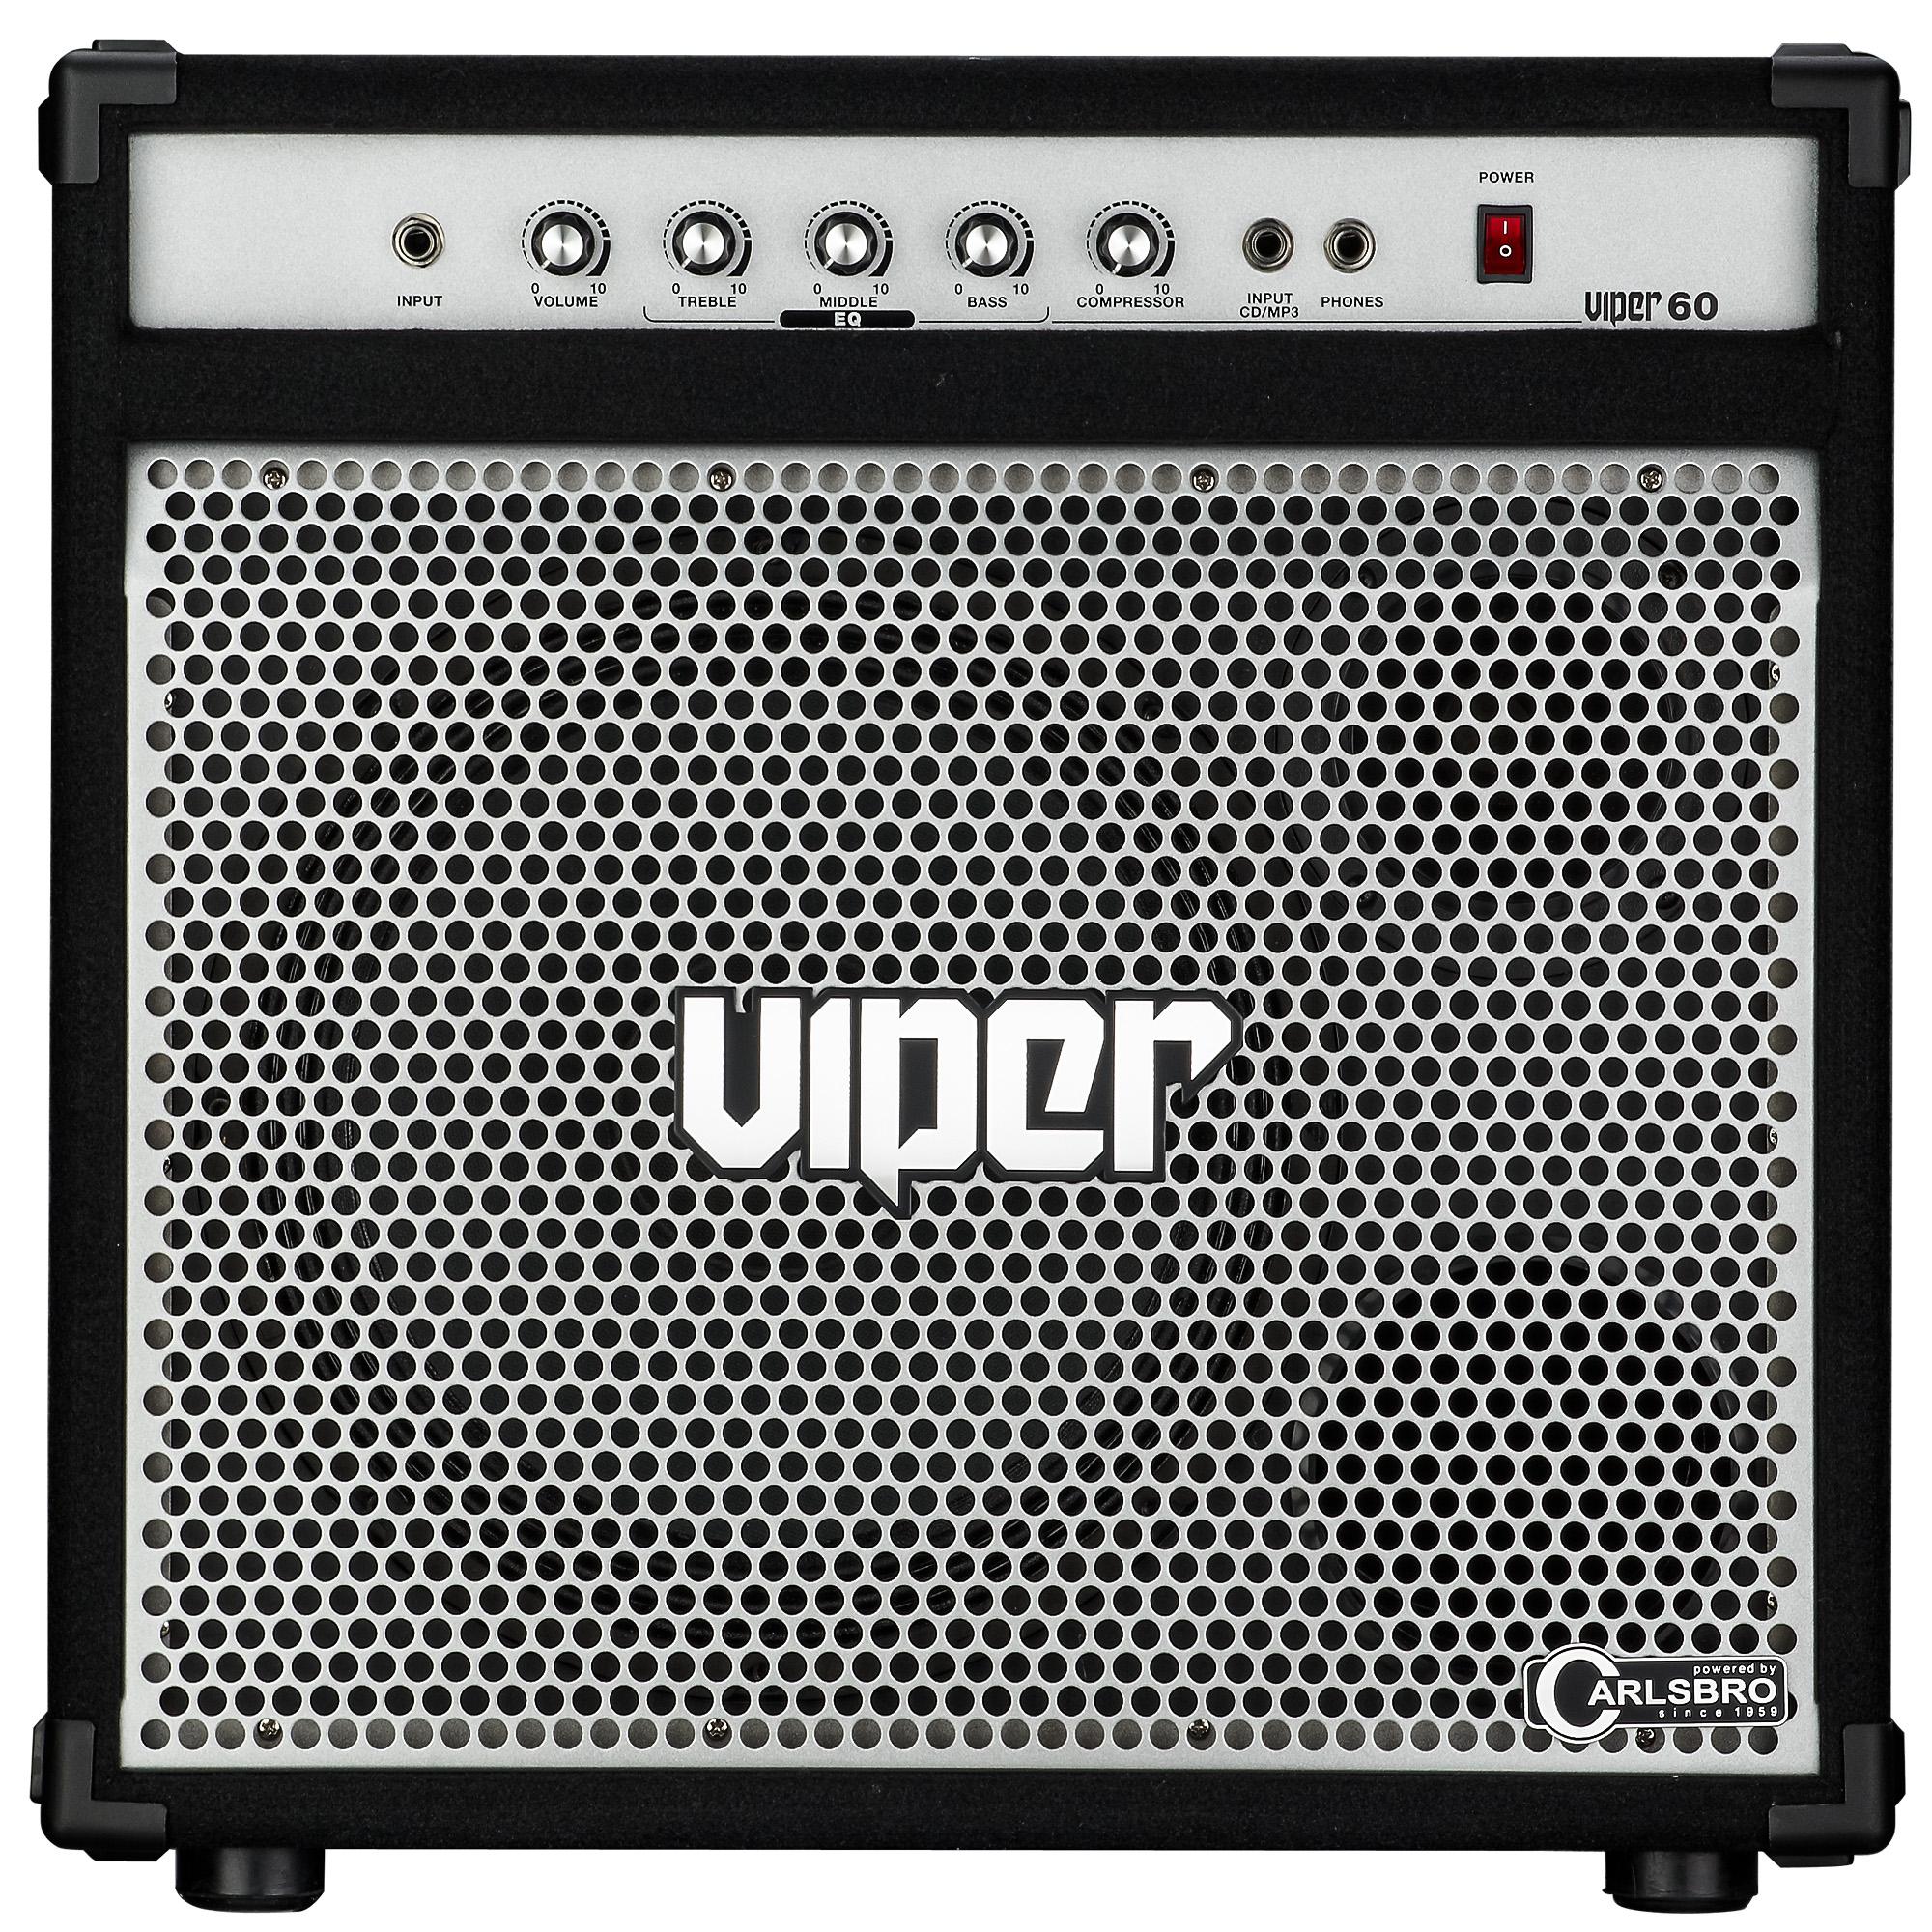 CARLSBRO VIPER60 60W Bass Amplifier Combo